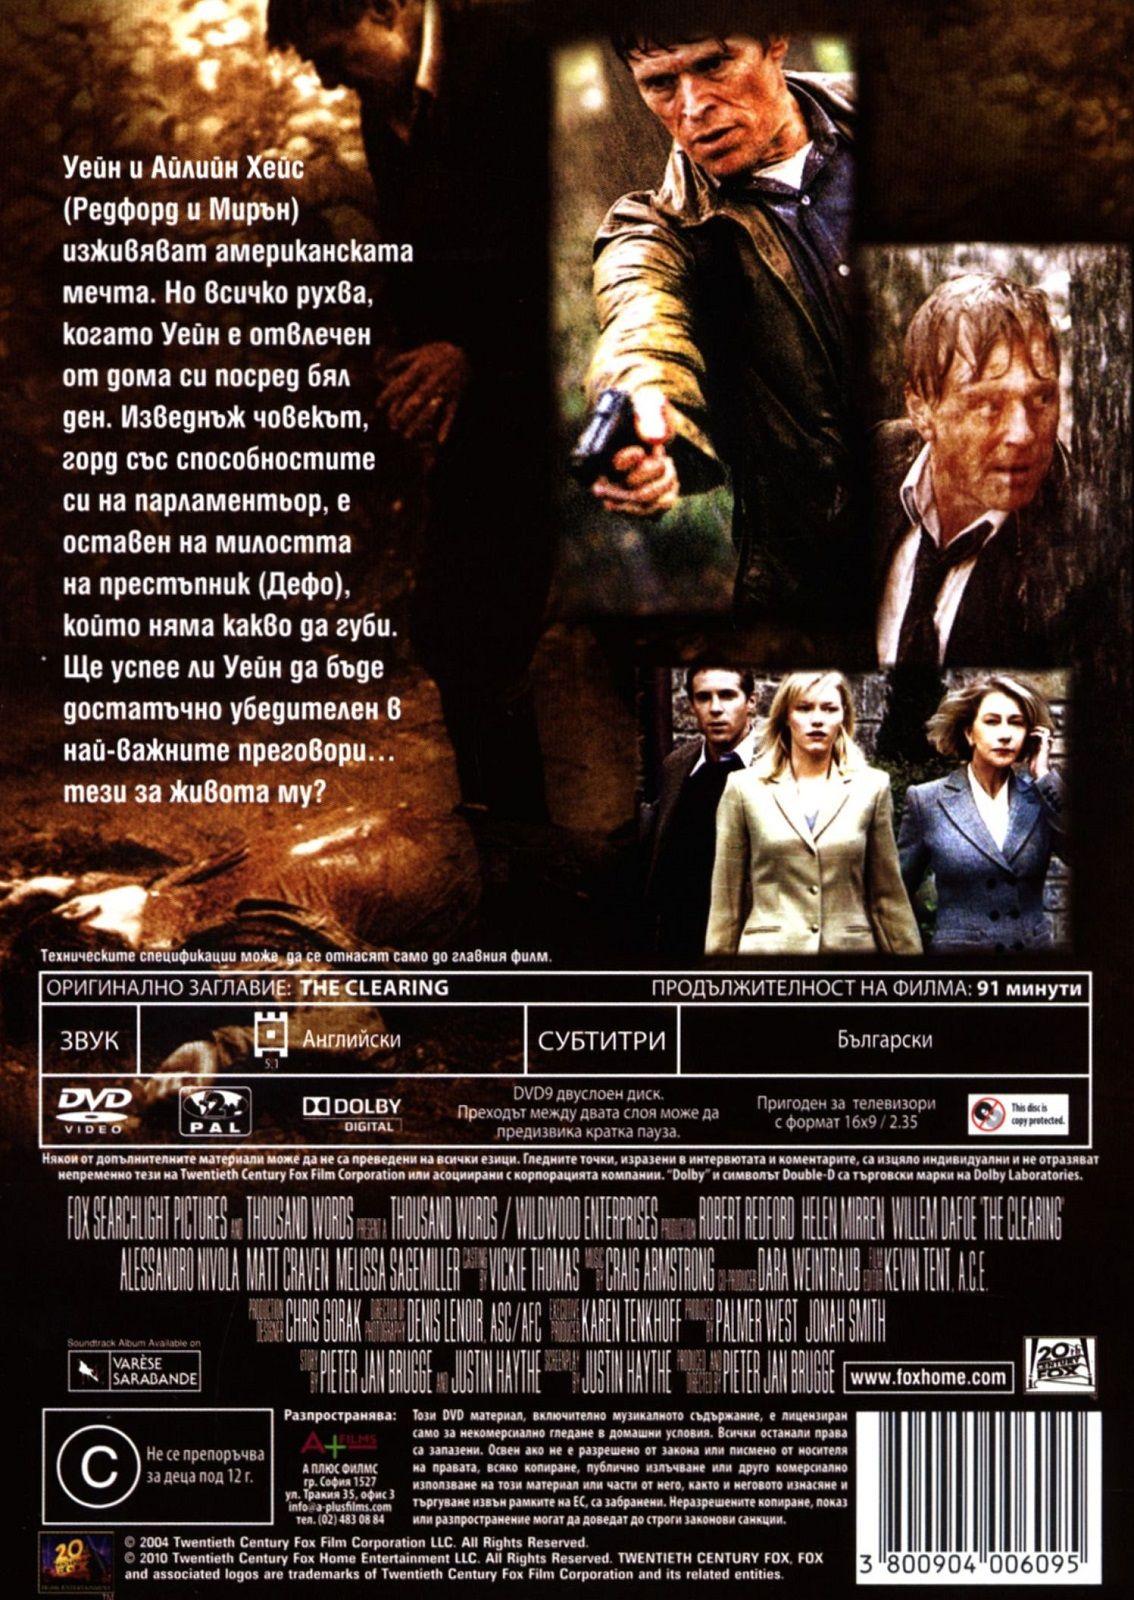 Катарзис (DVD) - 2